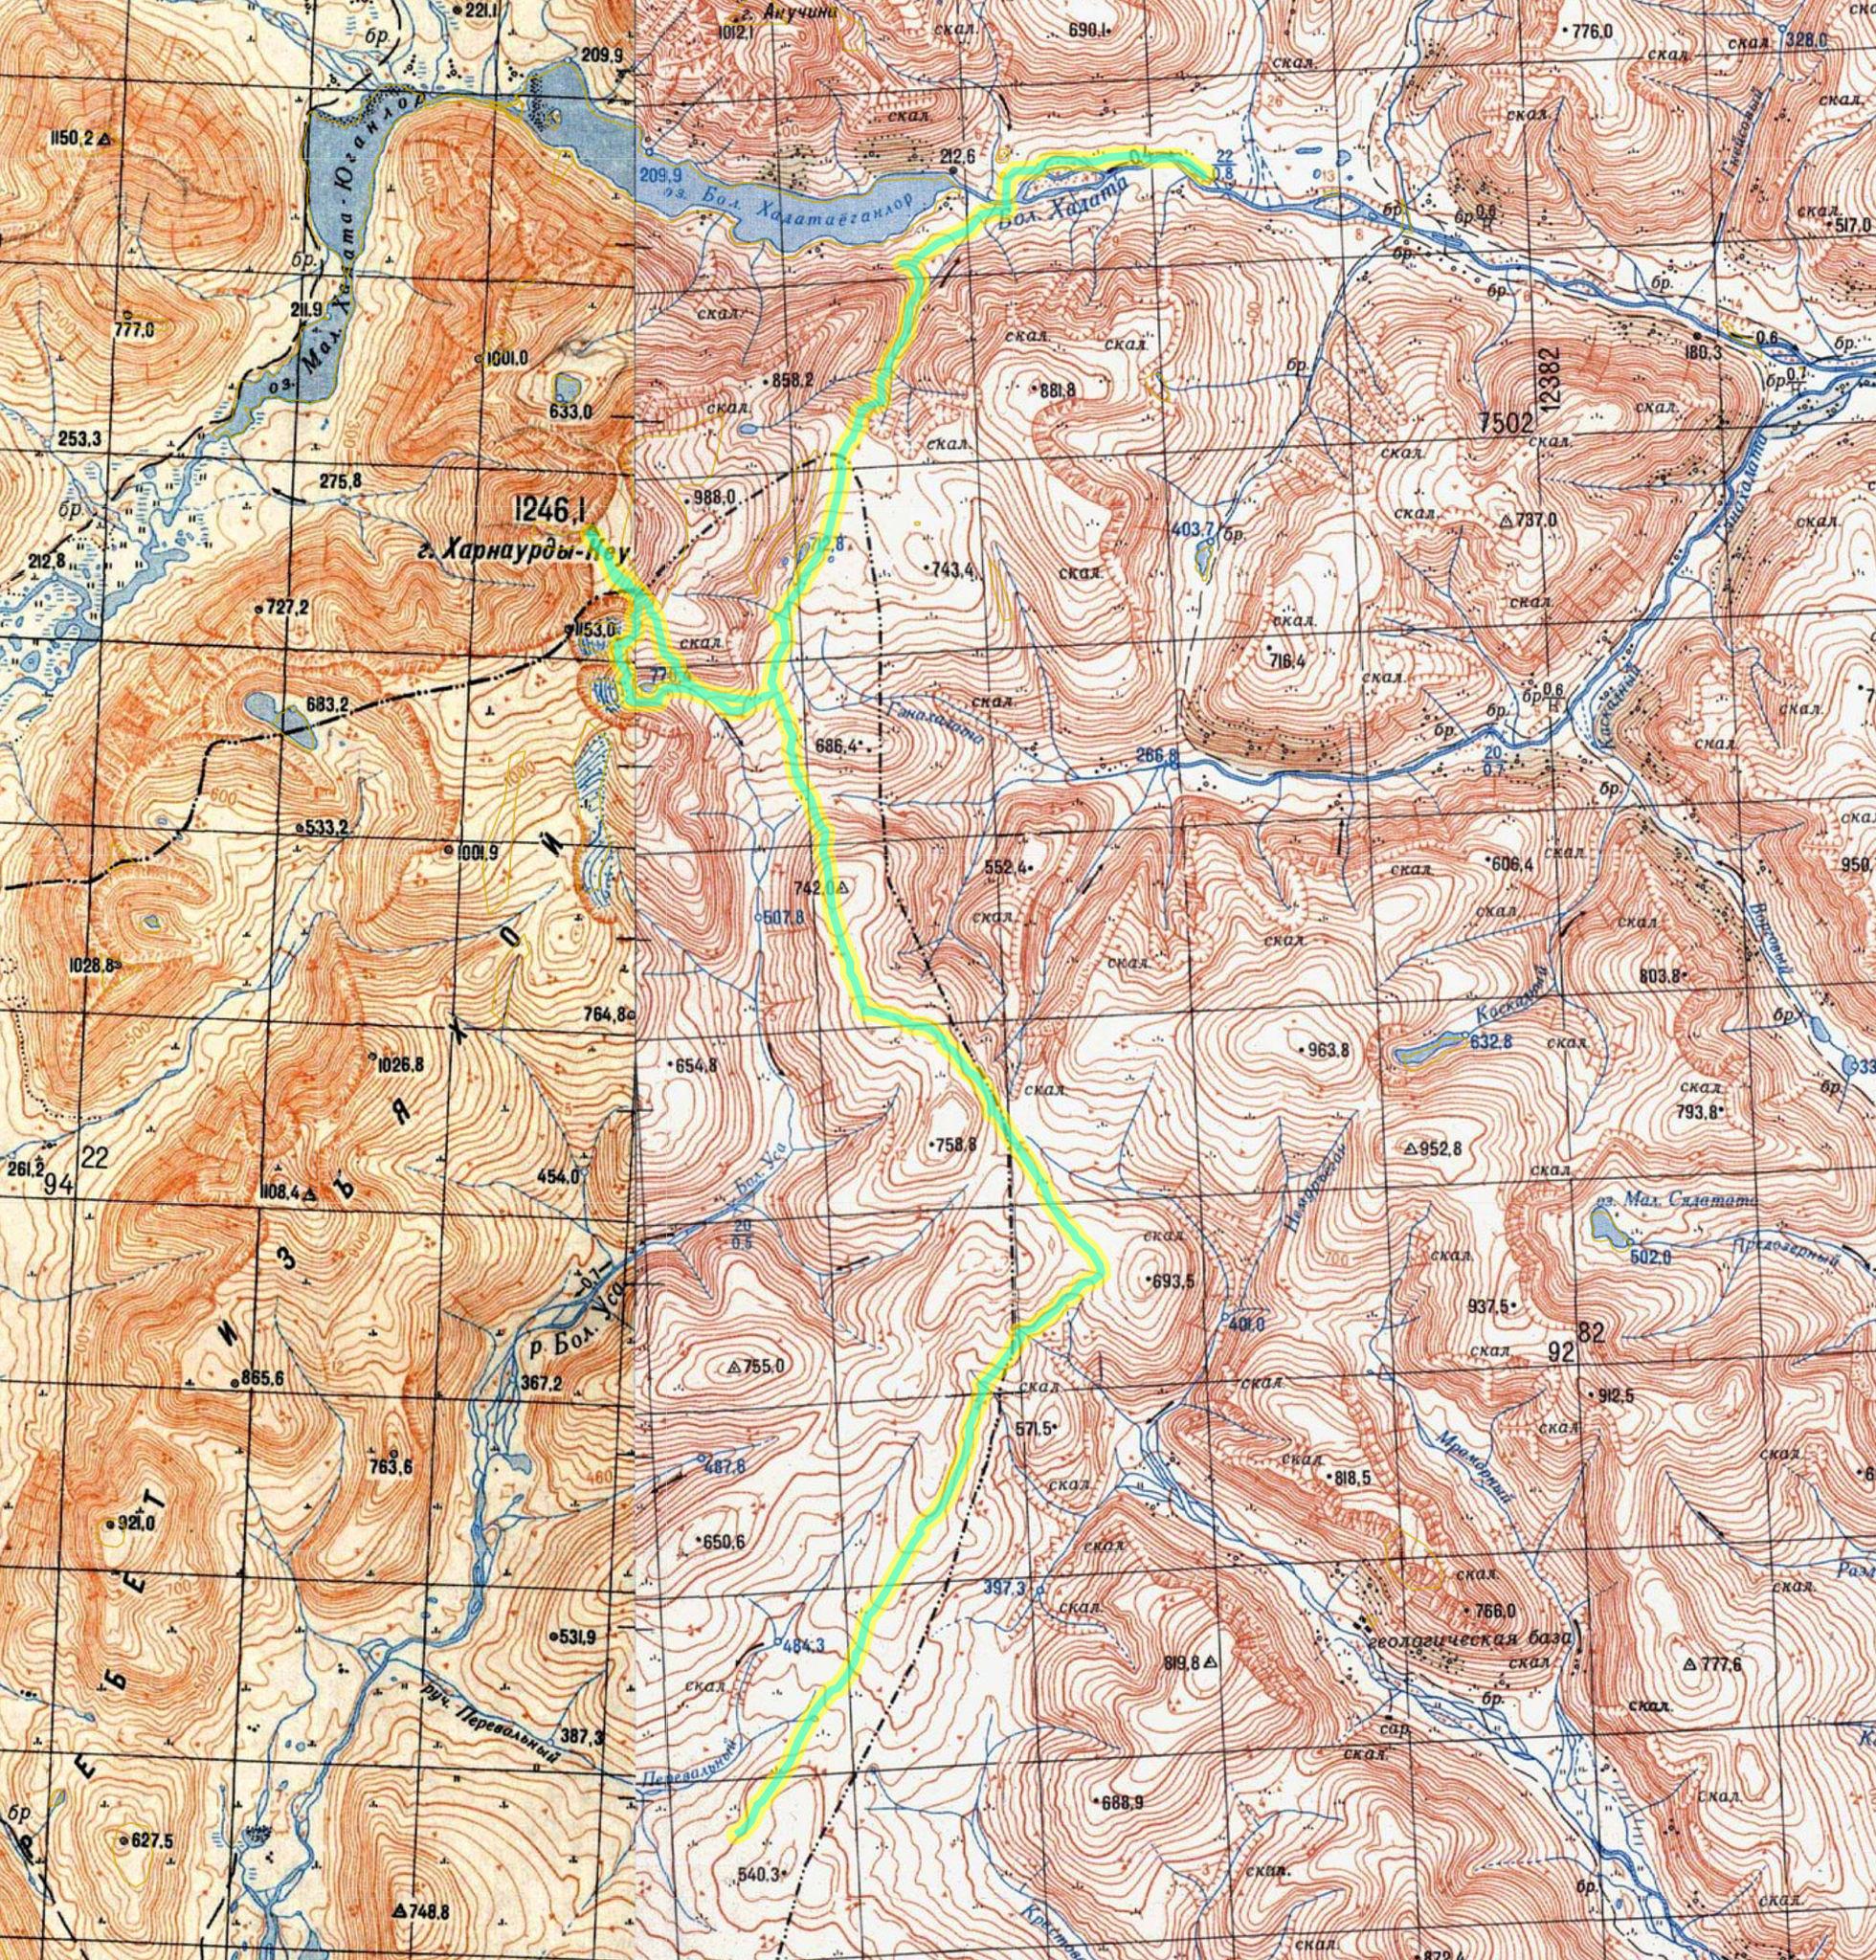 высота 540 - ледник Кулика - Харнаурдыкеу - Большая Хадата